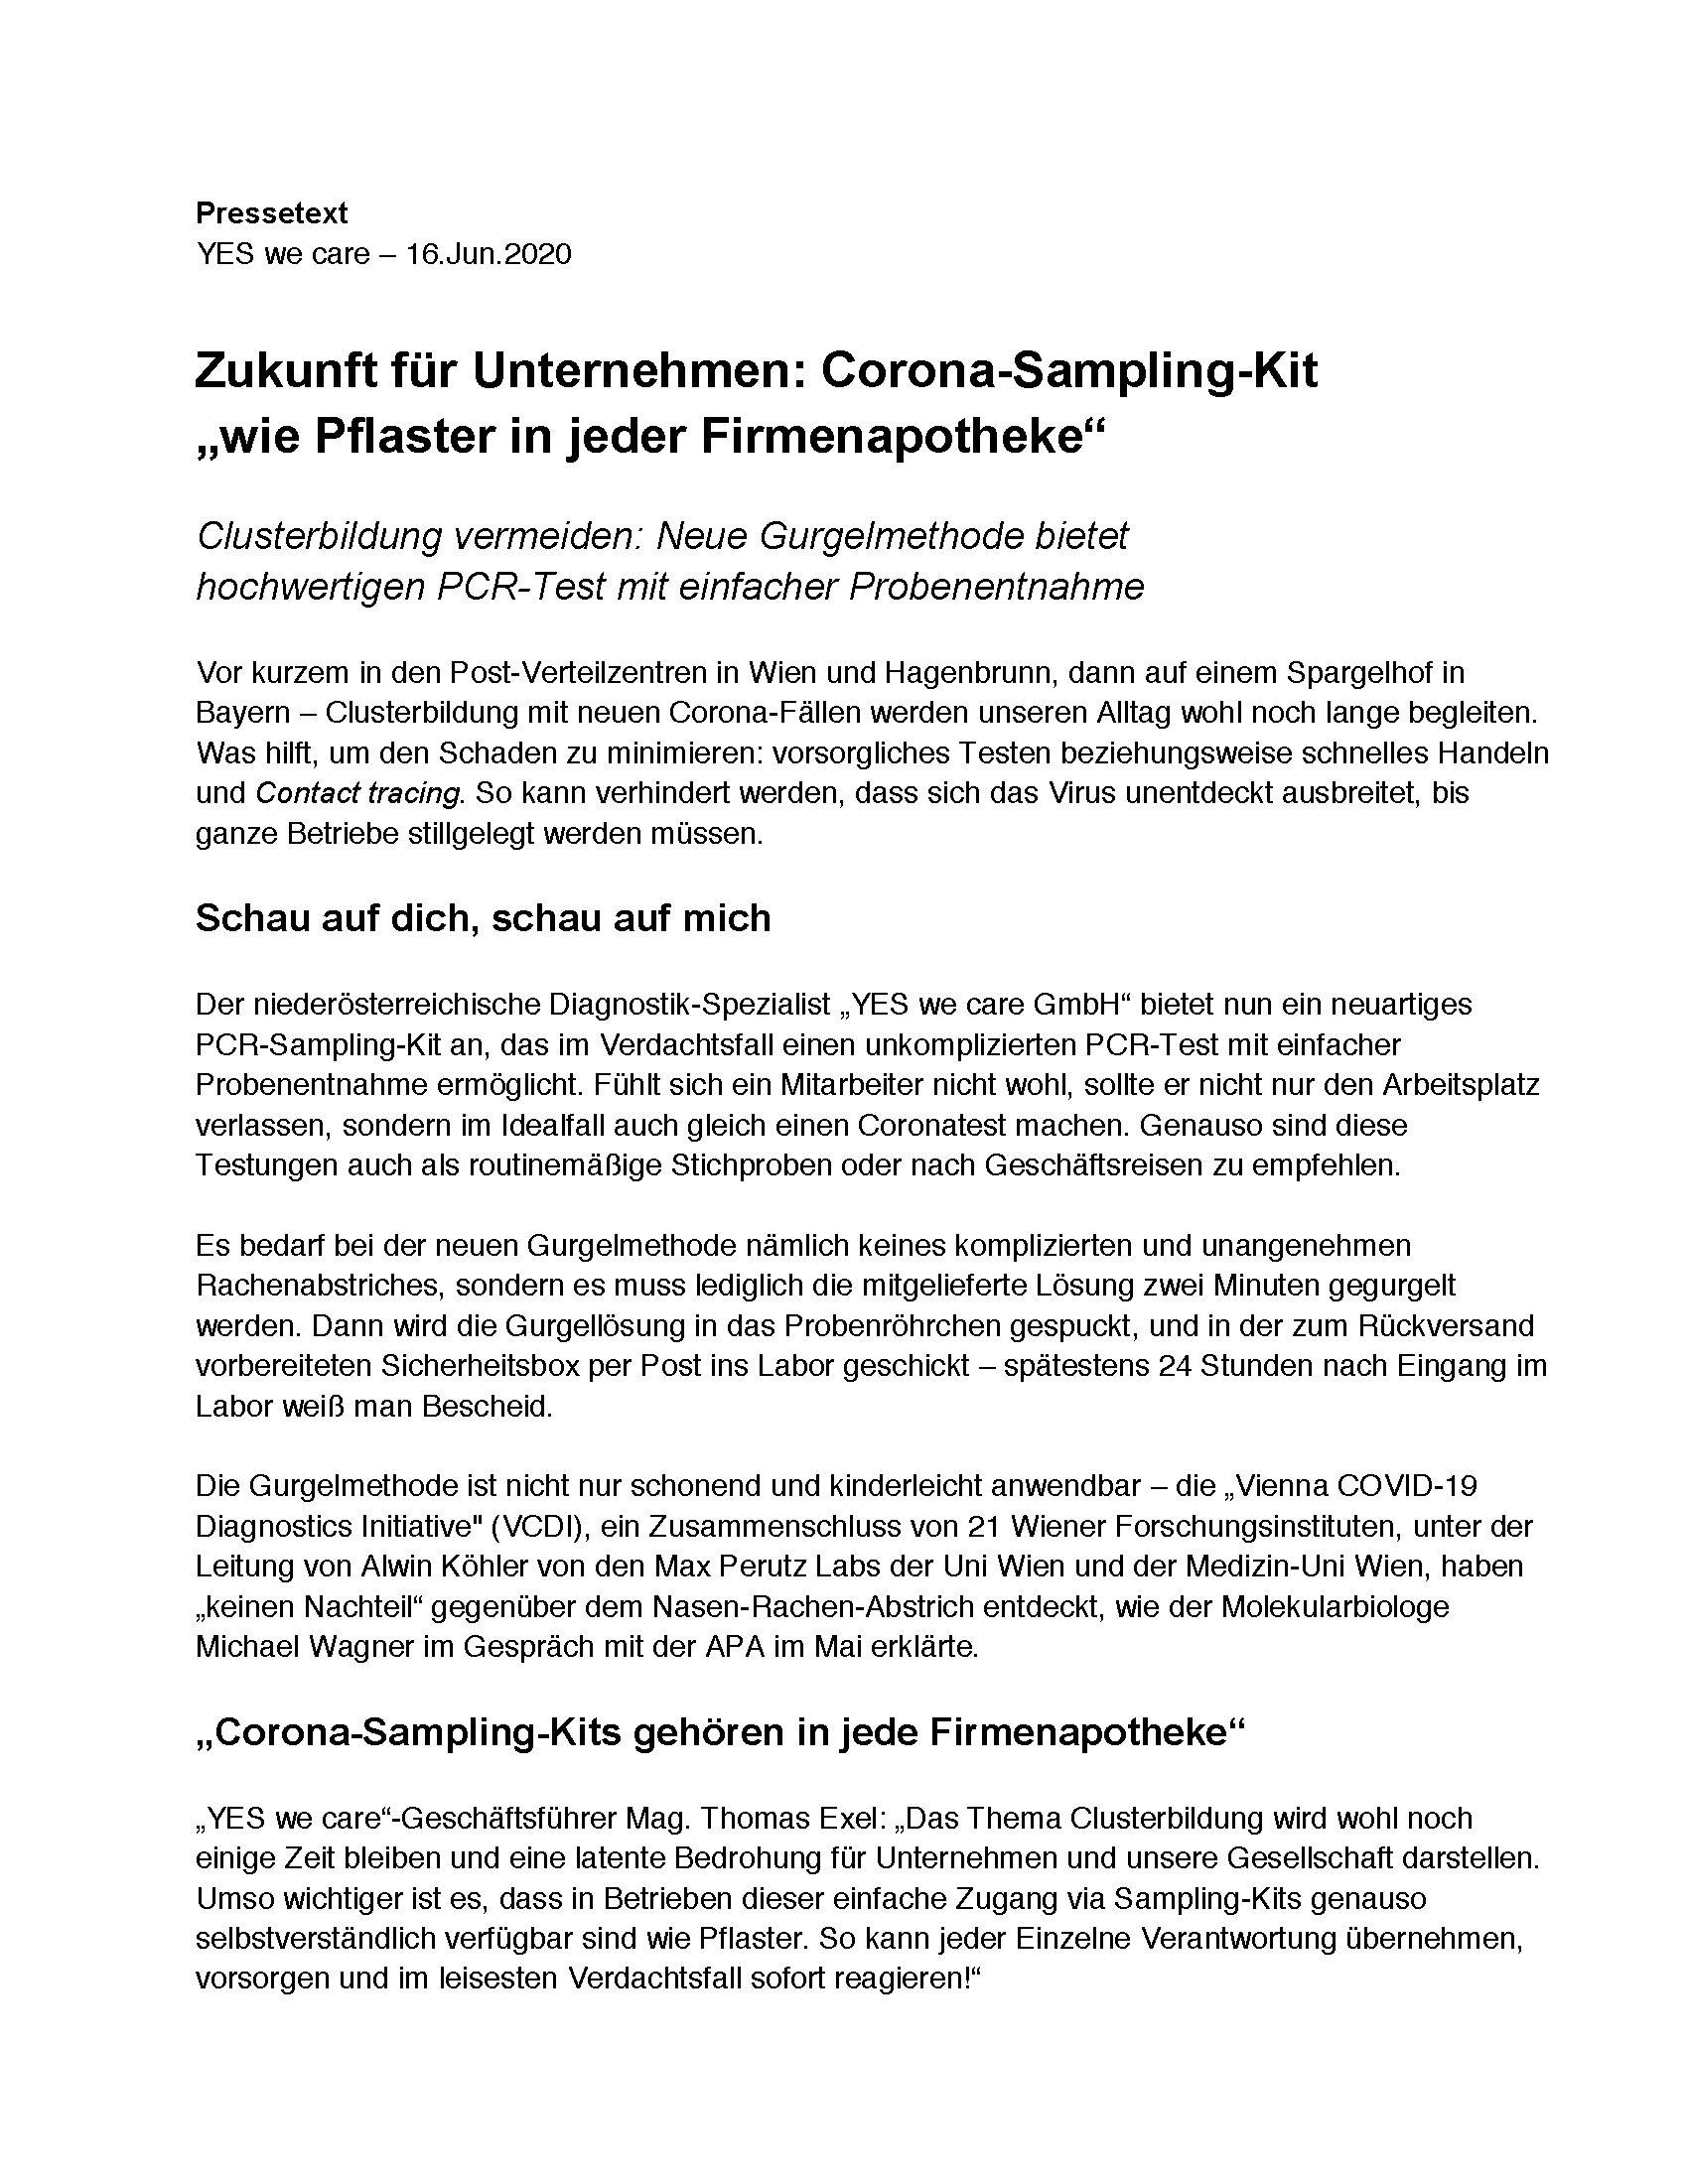 YES we care Corona-Sampling-Kits Pressetext